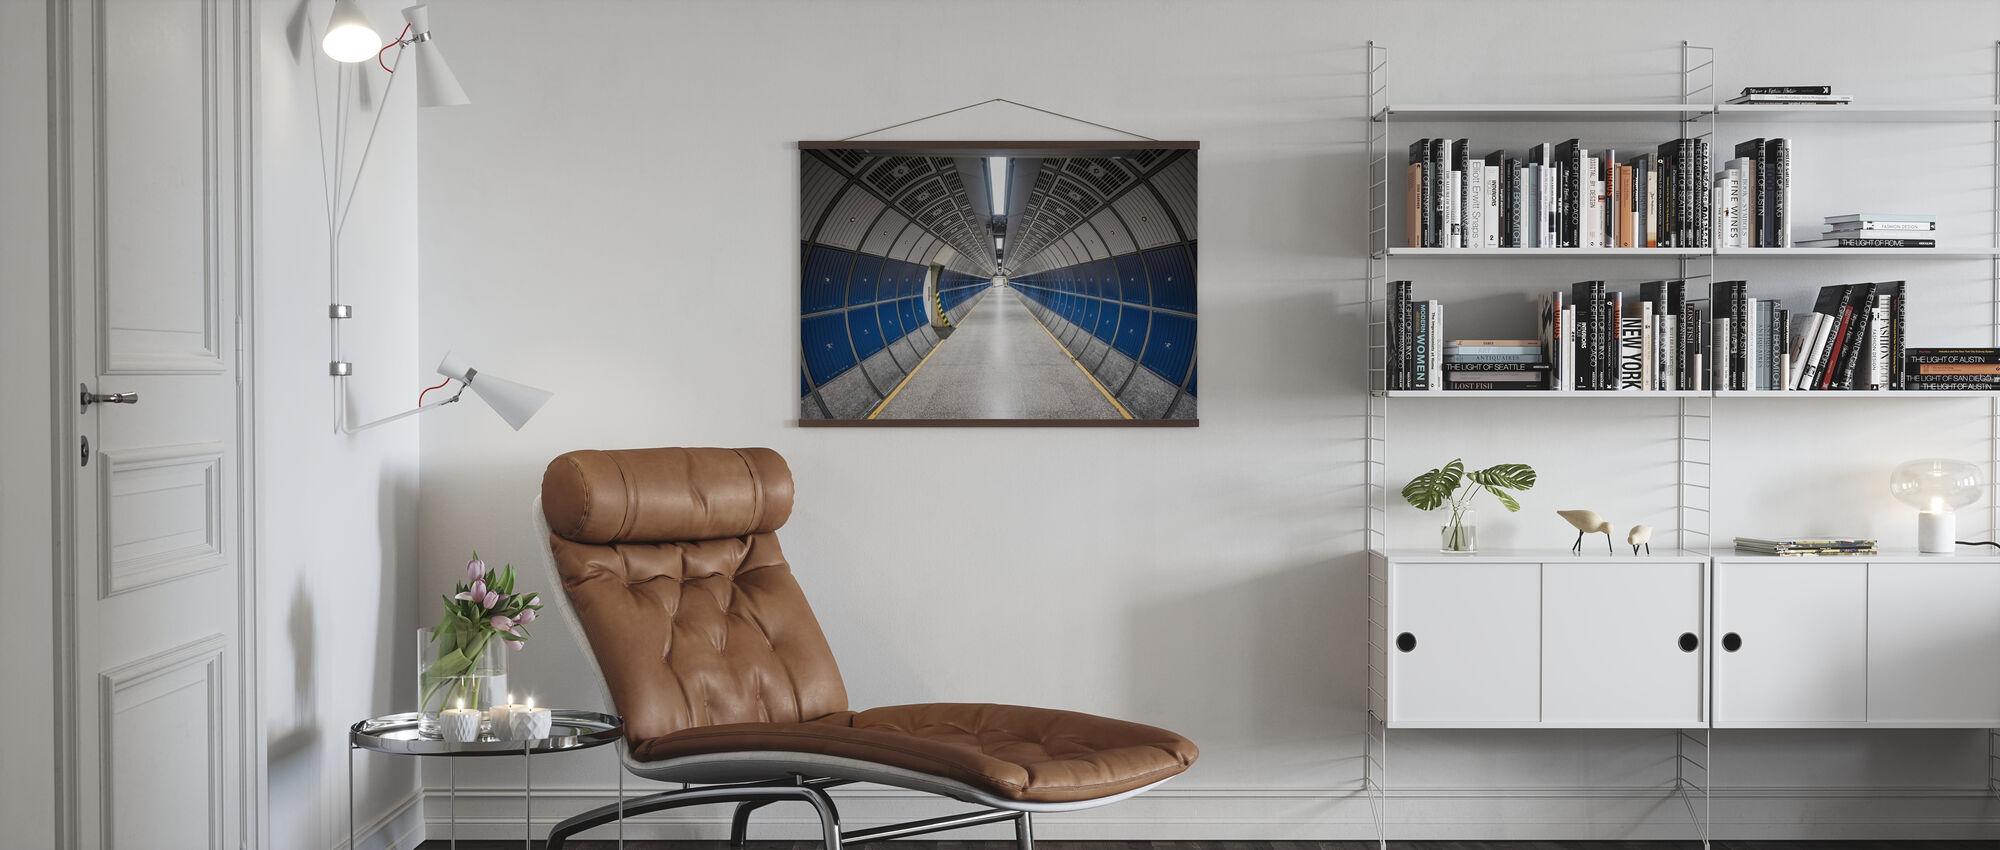 Modern Hallway - Poster - Living Room